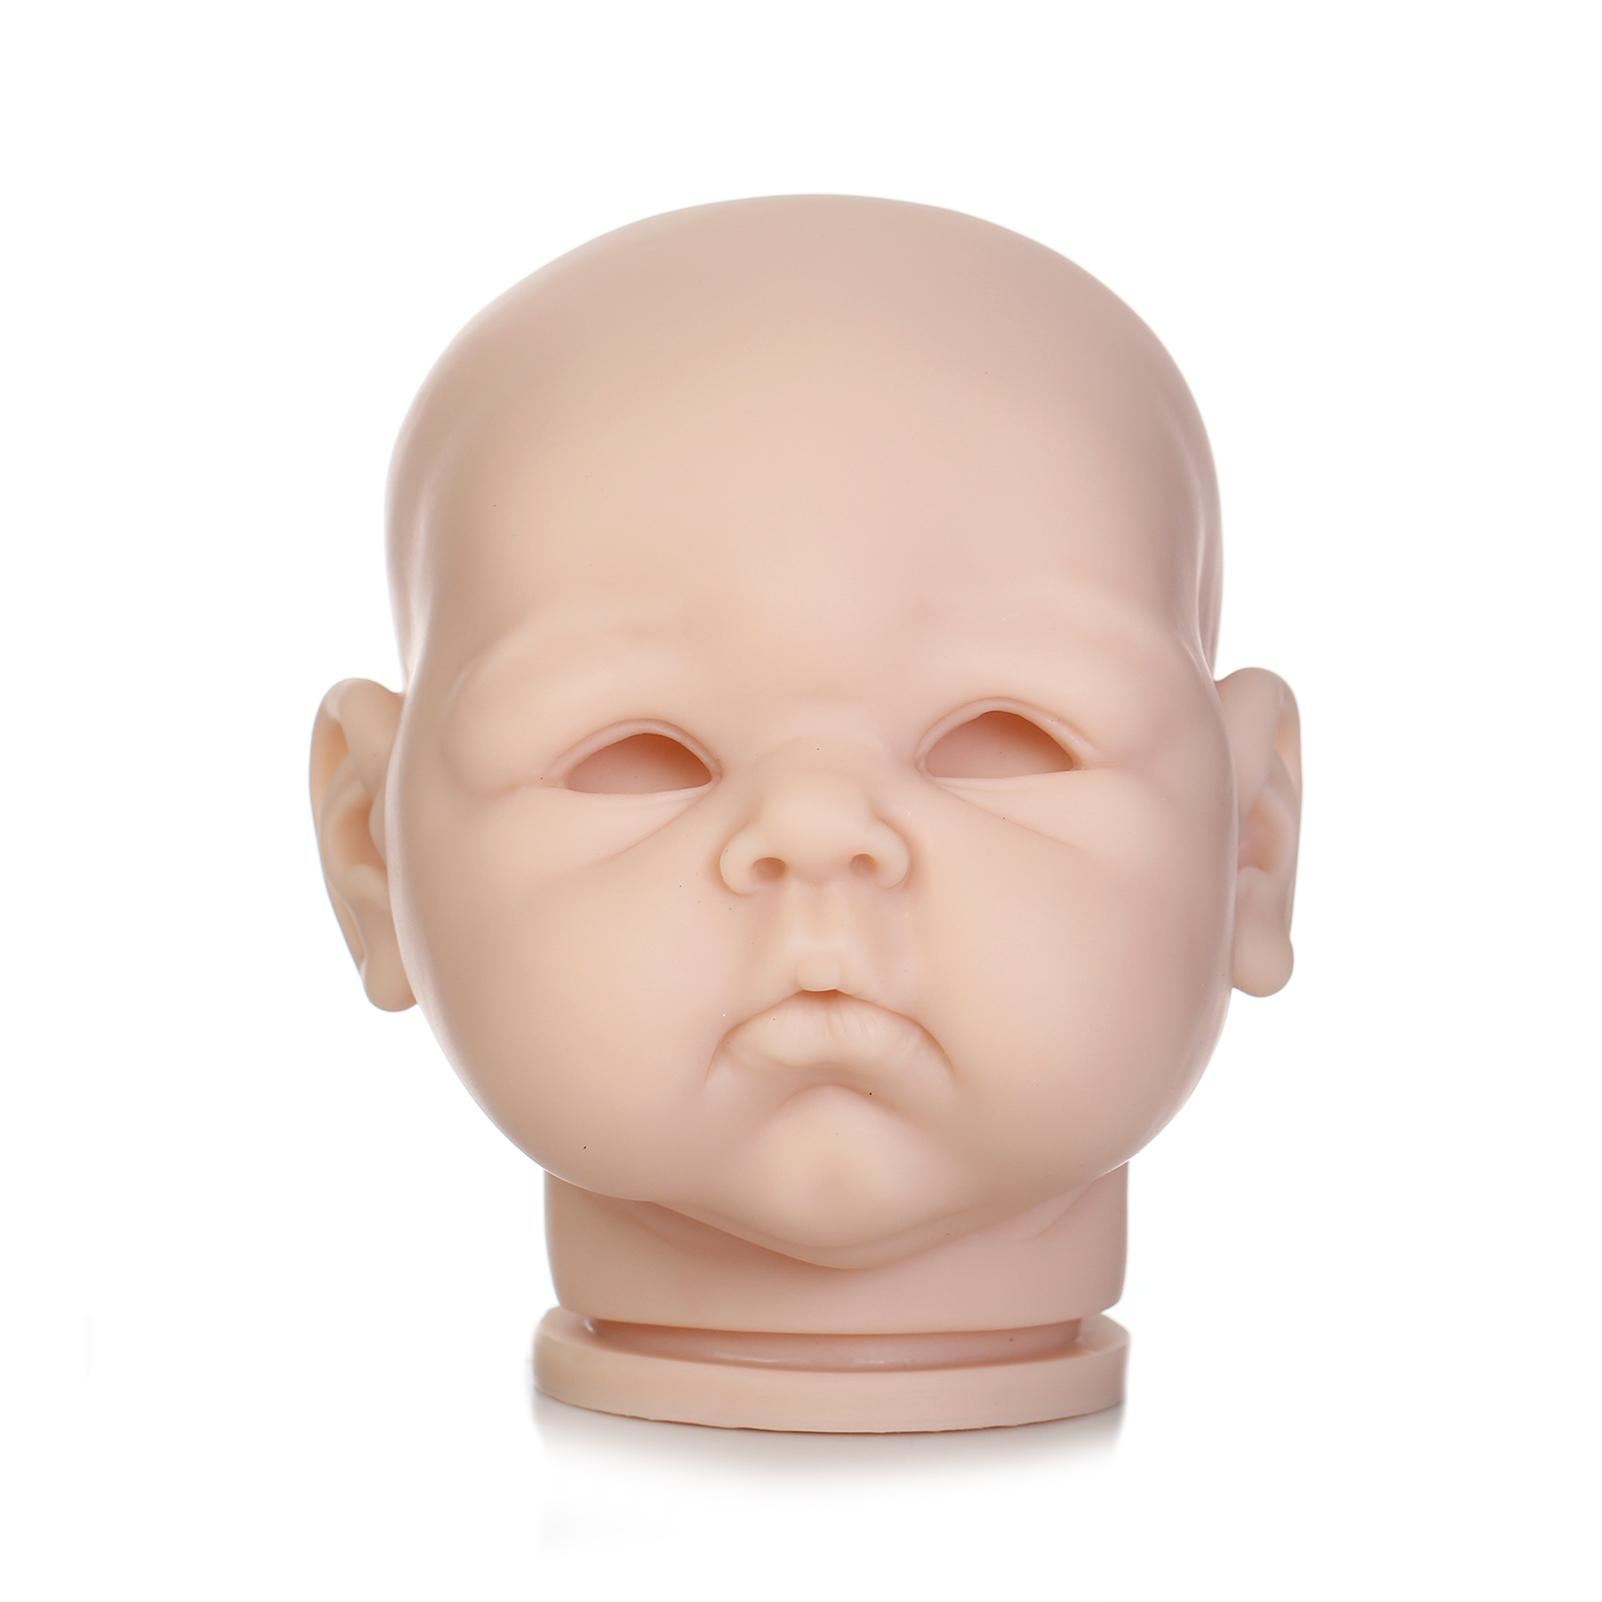 Unpainted Vinyl Doll Kits DIY 12/'/' Reborn Sleeping Baby Doll Head+3//4 Limbs Kits